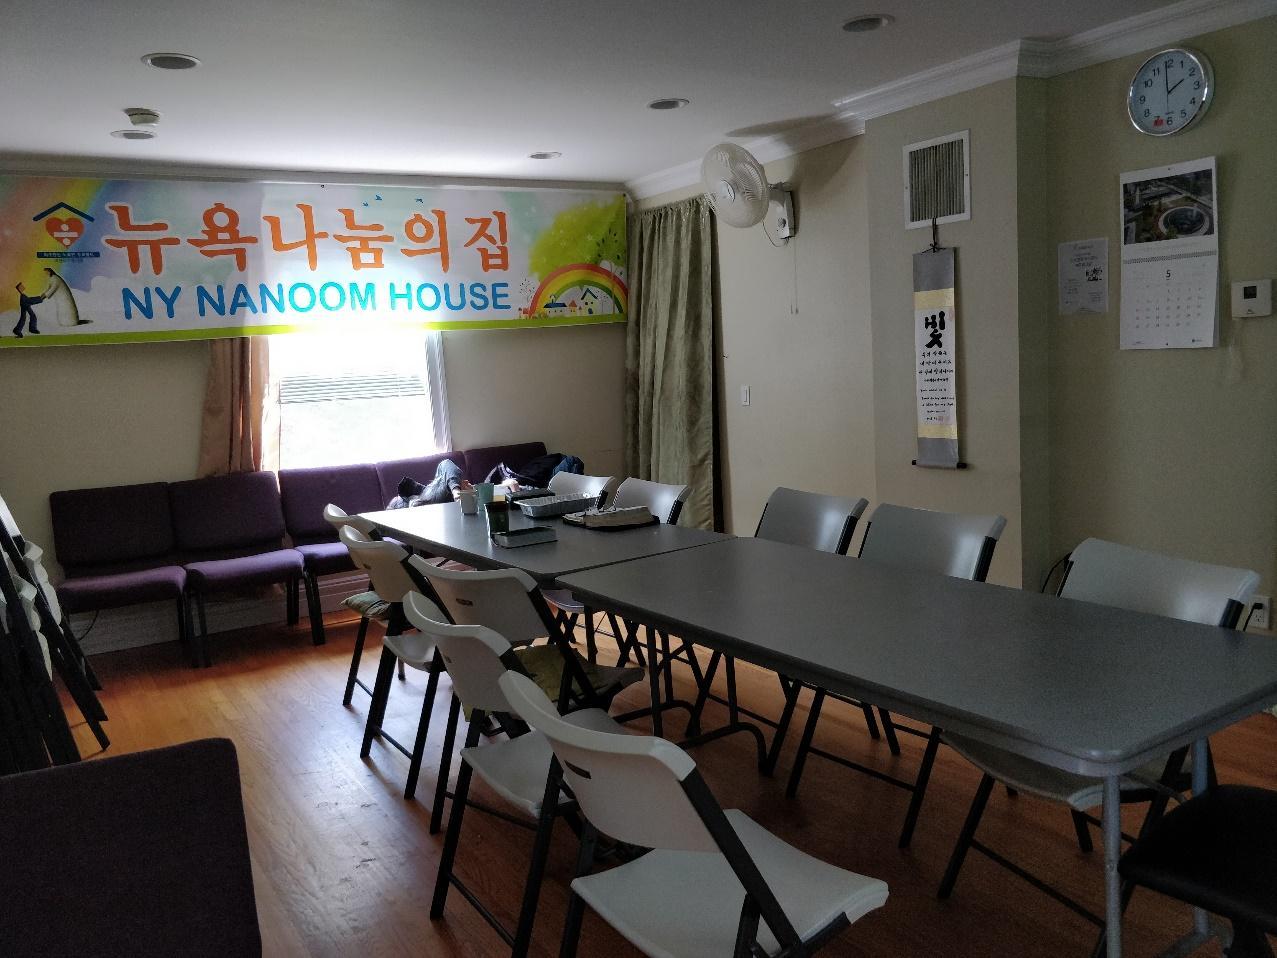 C:\Users\Nanoom House\Downloads\IMG_20190502_135741.jpg